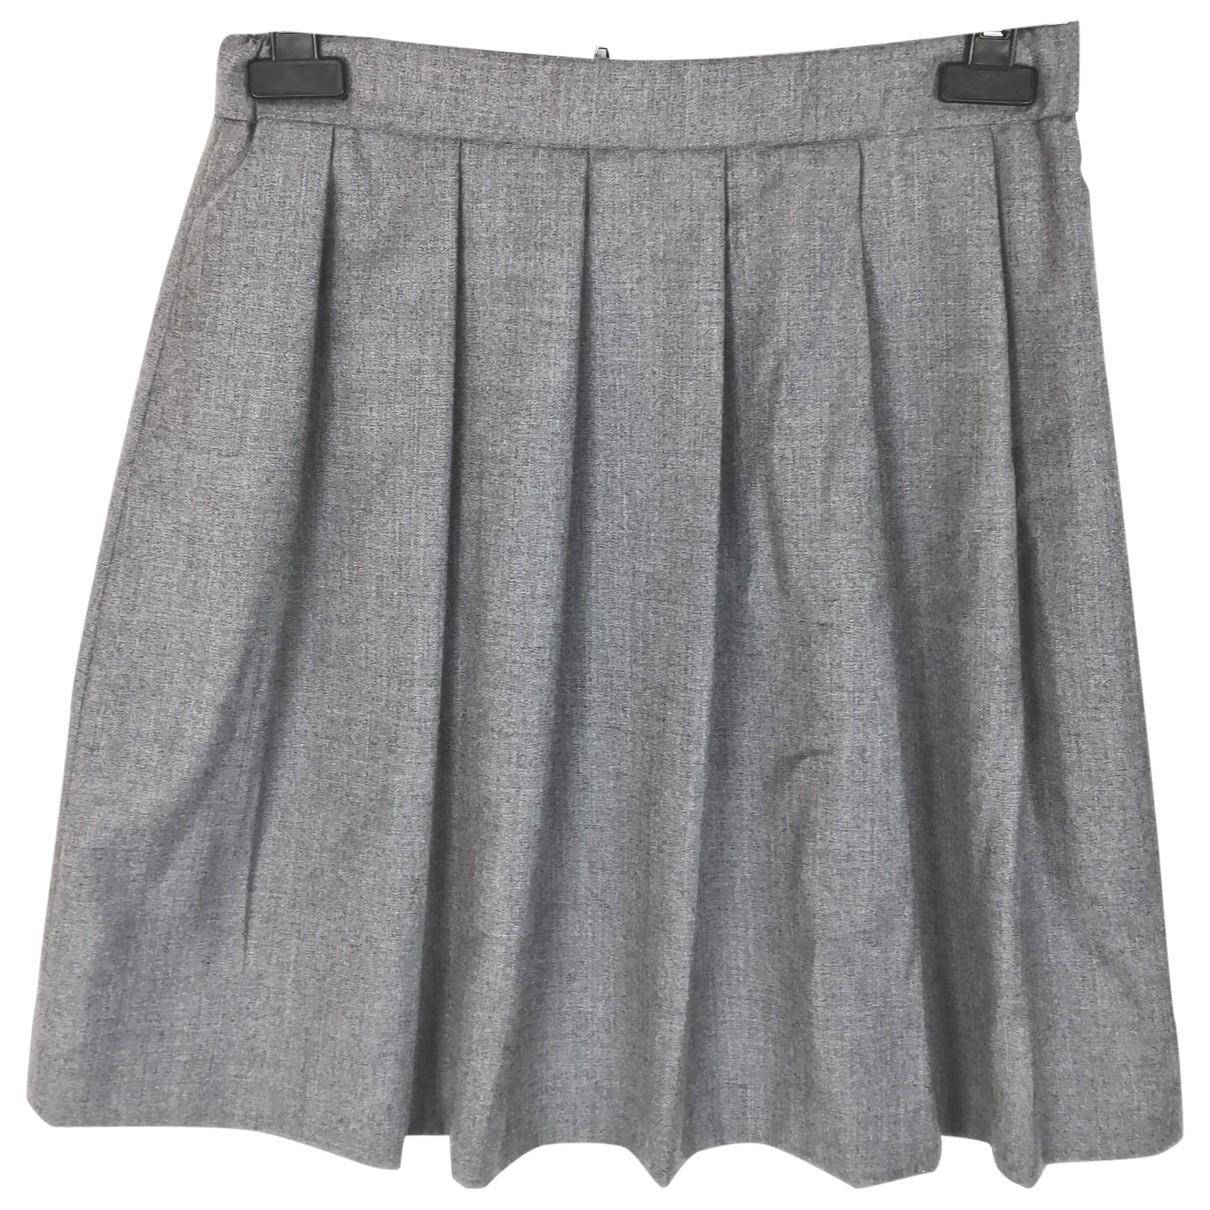 Selected \N Grey Wool skirt for Women S International